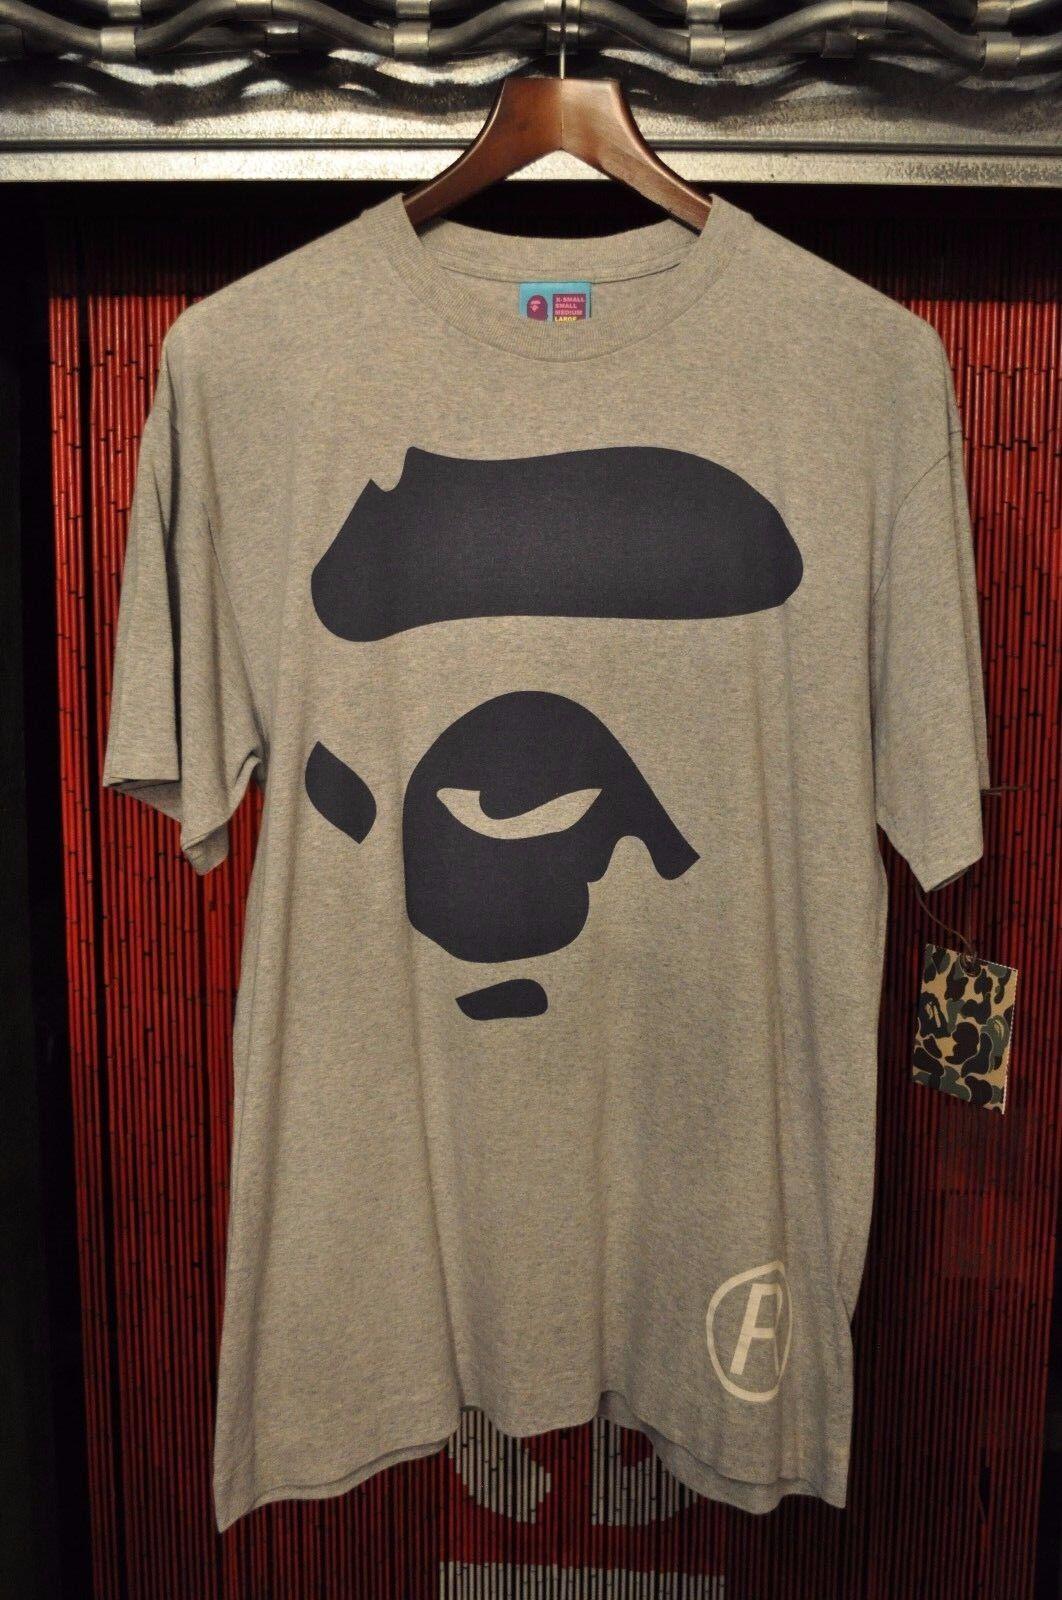 83e7897dd Bape A Bathing Ape Ape Face Grey Navy Nigo OG Shirt Large T L nbnkgz14740-T- Shirts